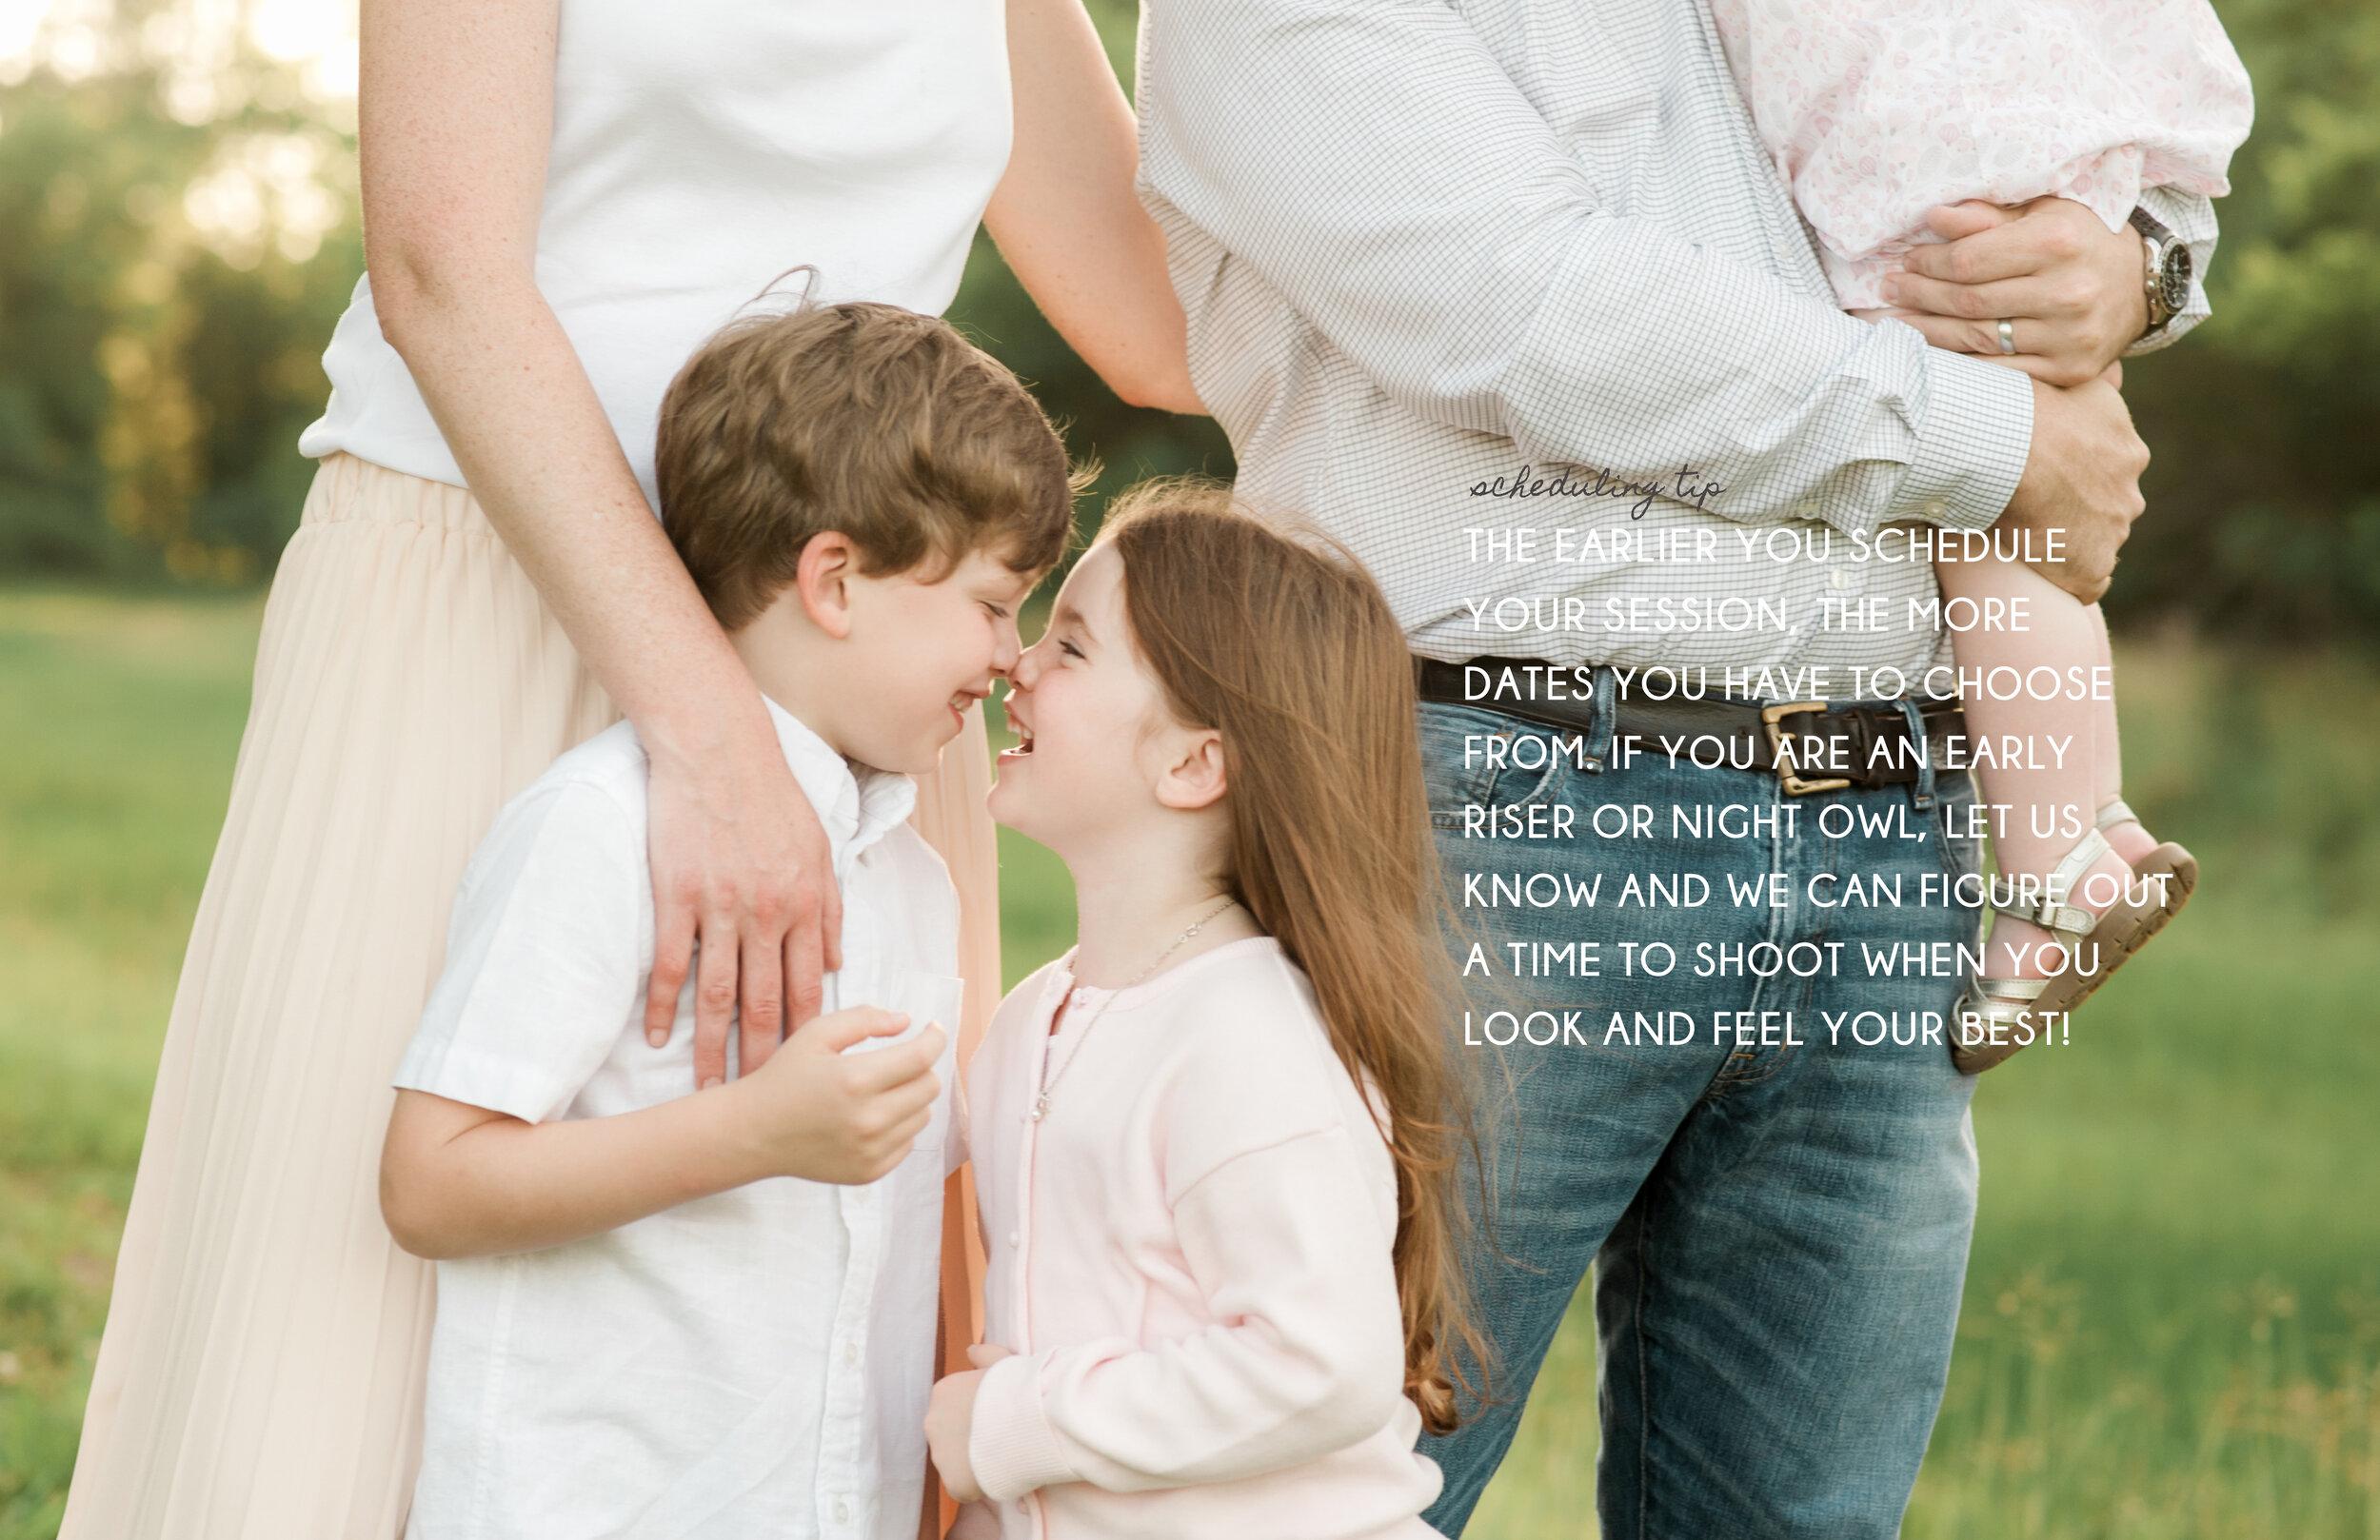 familymag010.jpg